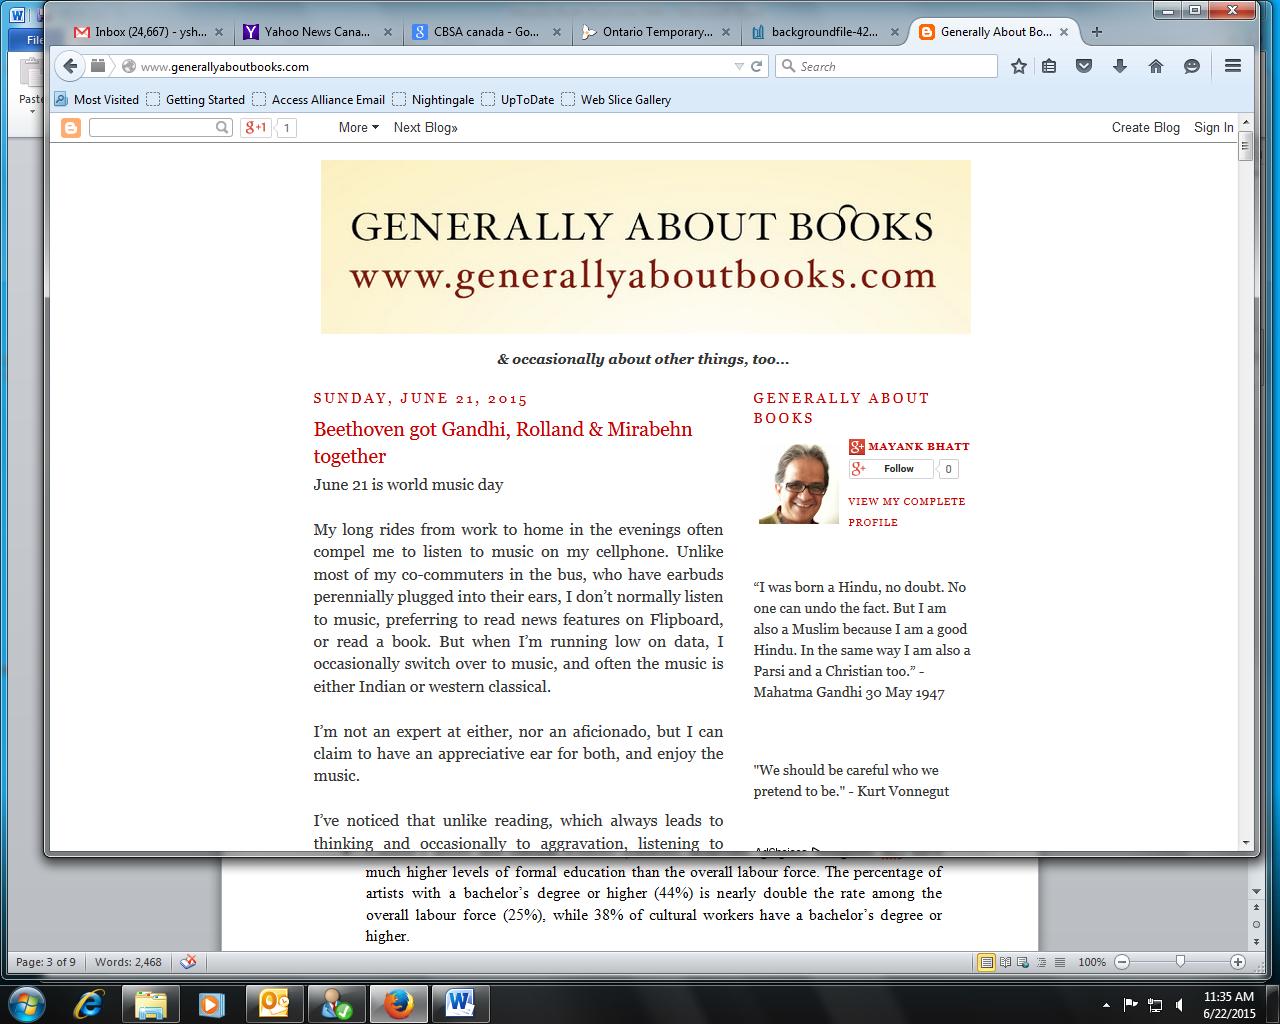 South asian diasporic writing a book